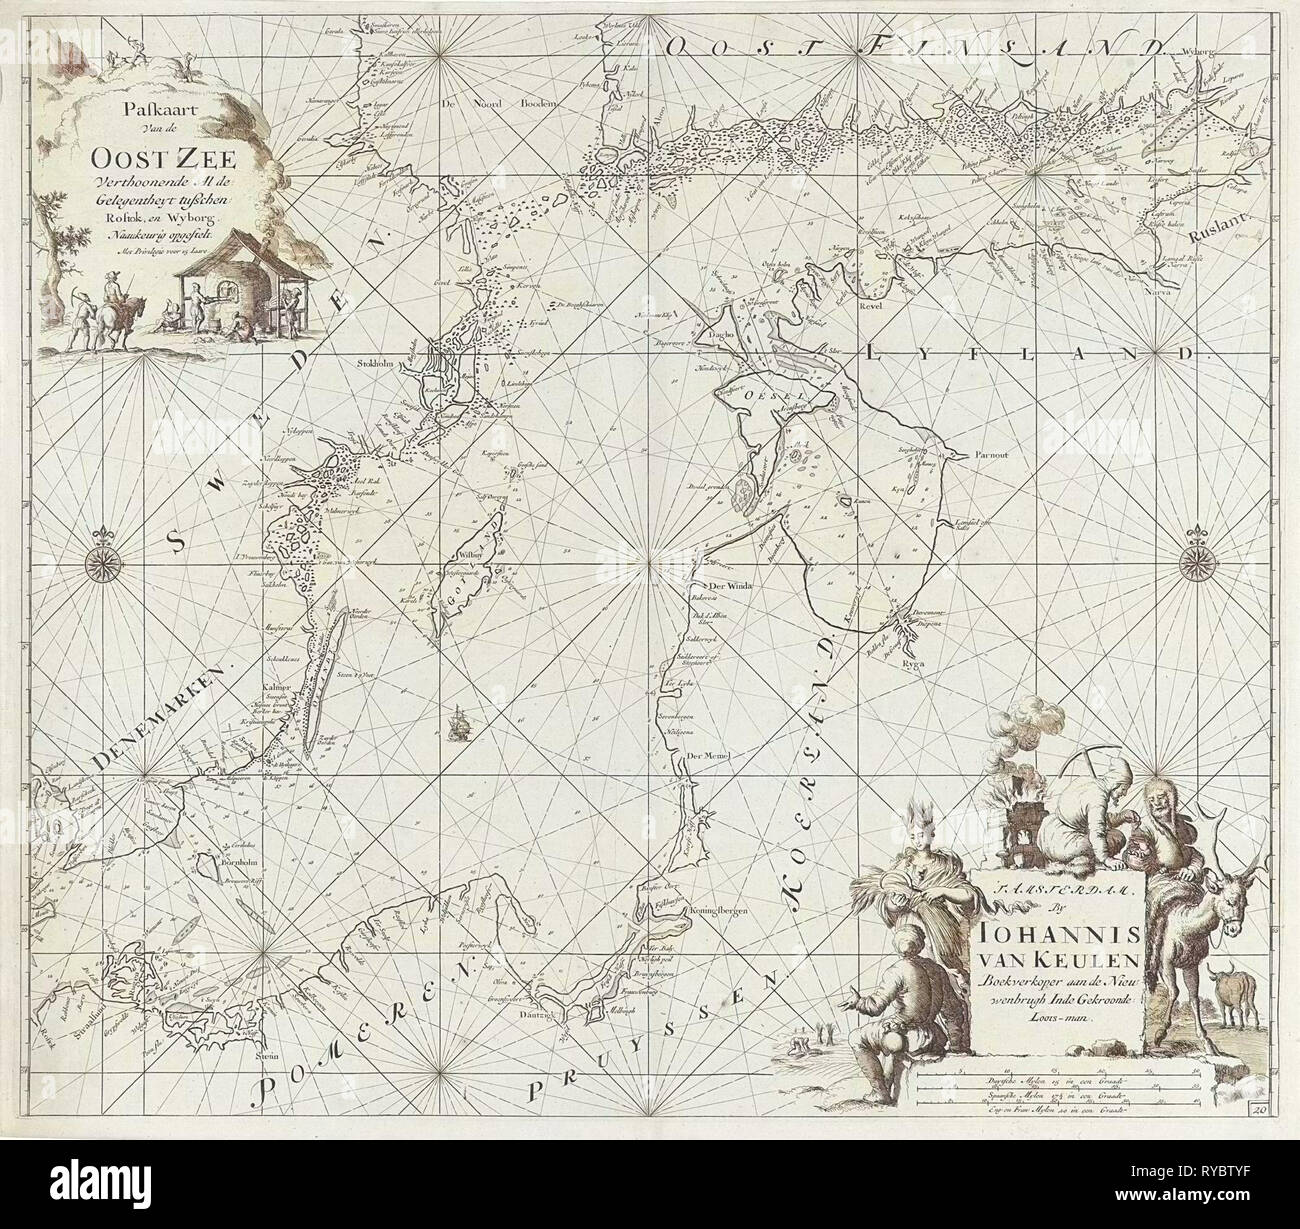 Sea chart of the Baltic Sea from Rostock to Vyborg, Jan Luyken, Johannes van Keulen (I), unknown, 1681 - 1799 Stock Photo